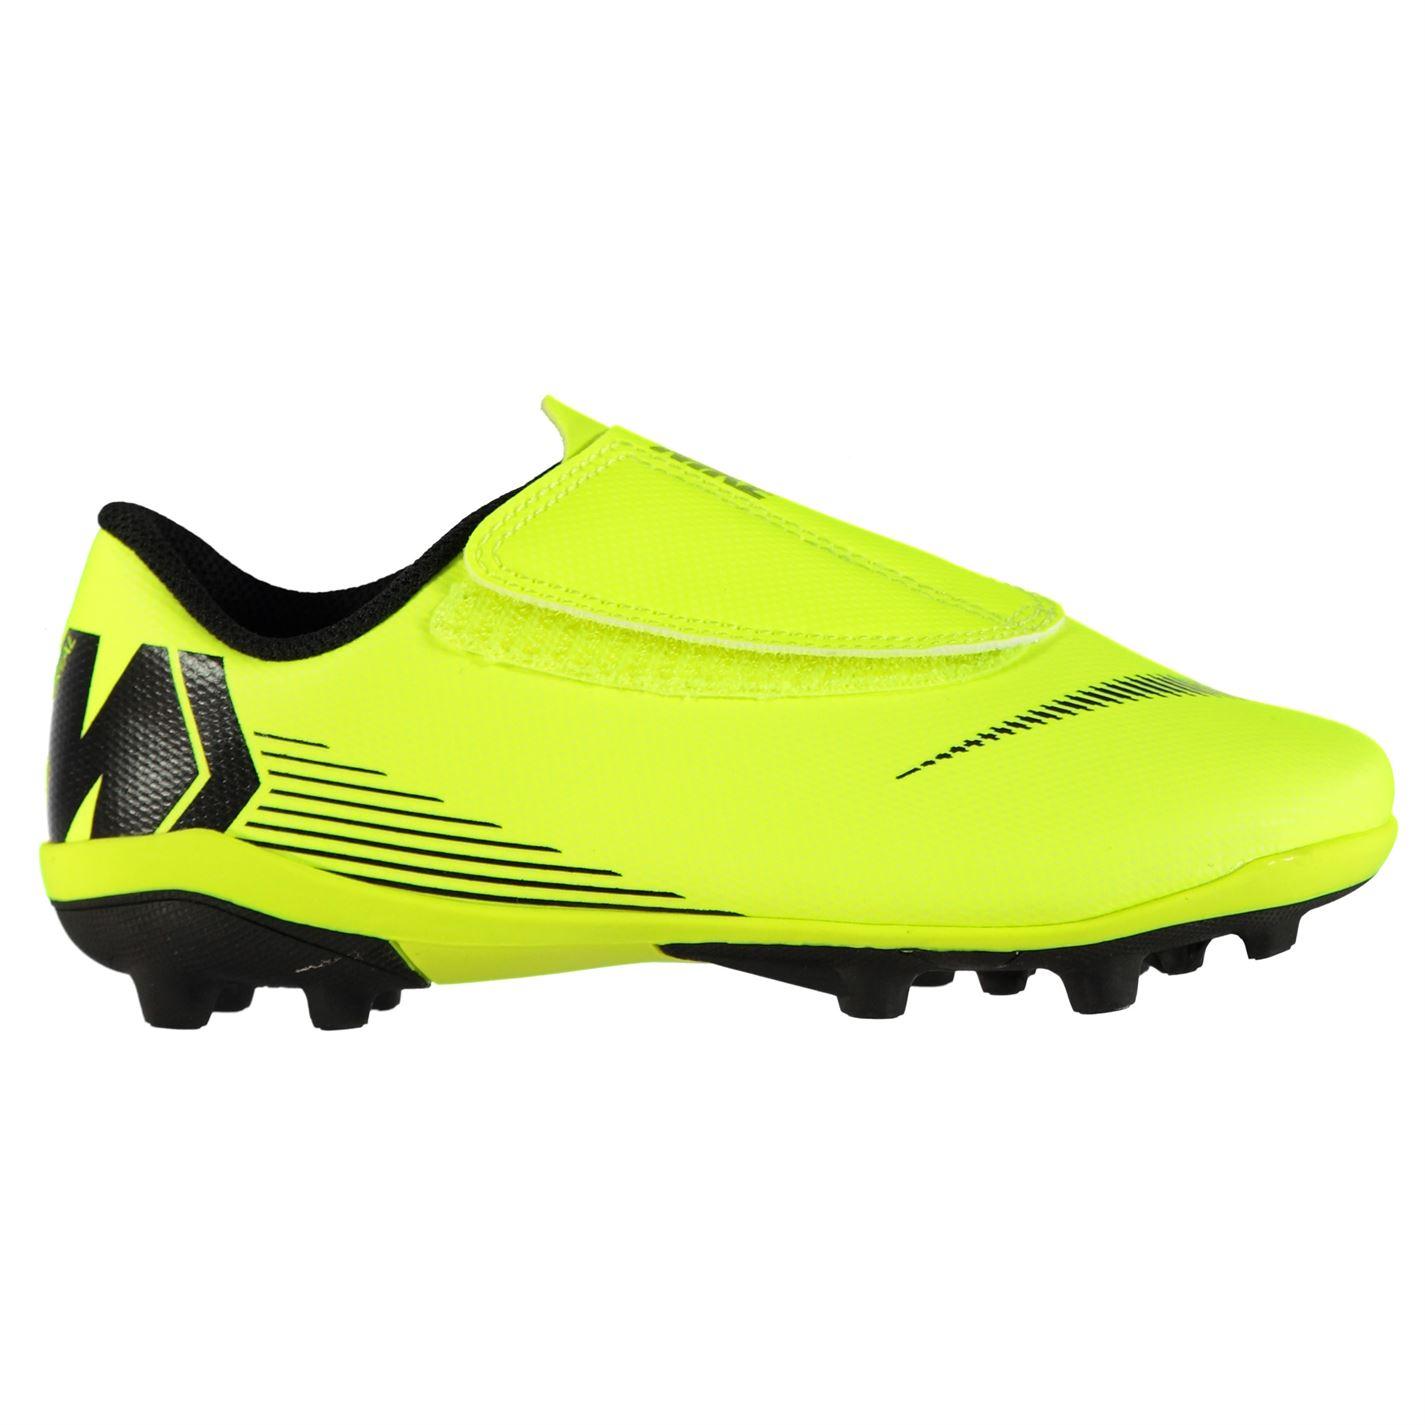 ef60c06e8279b Nike Mercurial Vapor Club Junior FG Football Boots